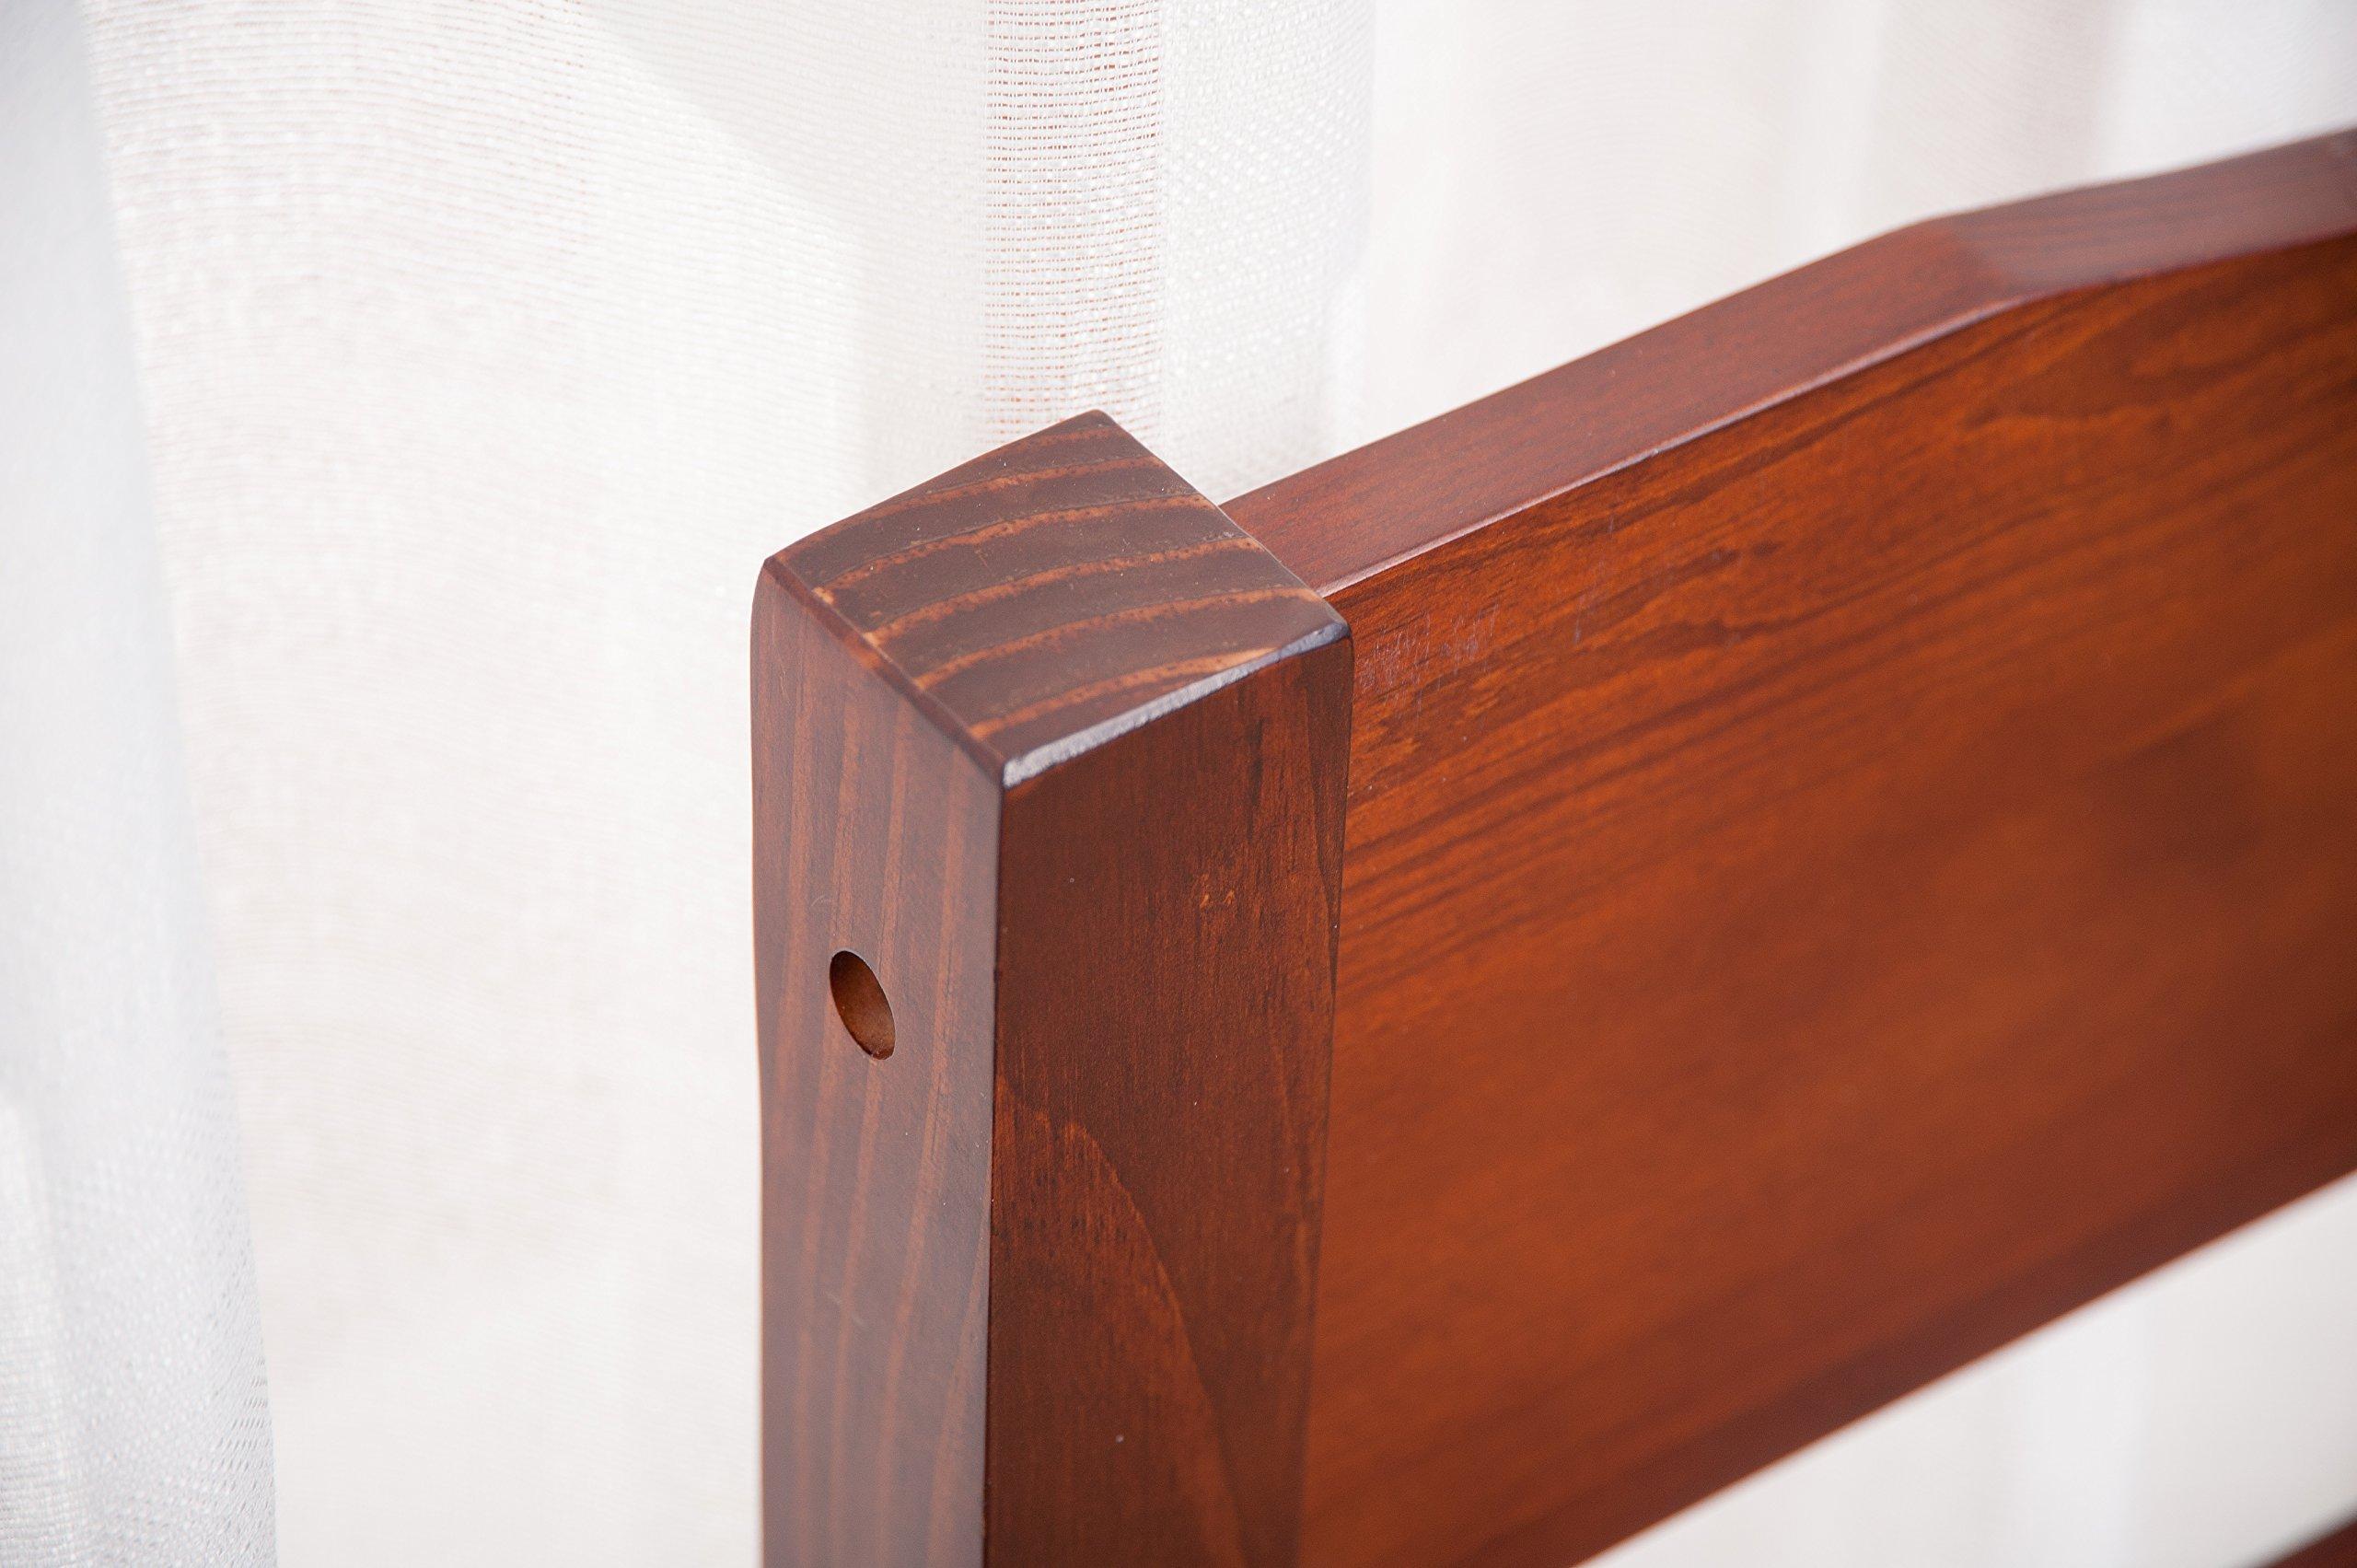 Merax Wood Platform Bed Frame with Headboard / No Box Spring Needed / Wooden Slat Support / Espresso Finish (-Walnut-) by Merax. (Image #5)